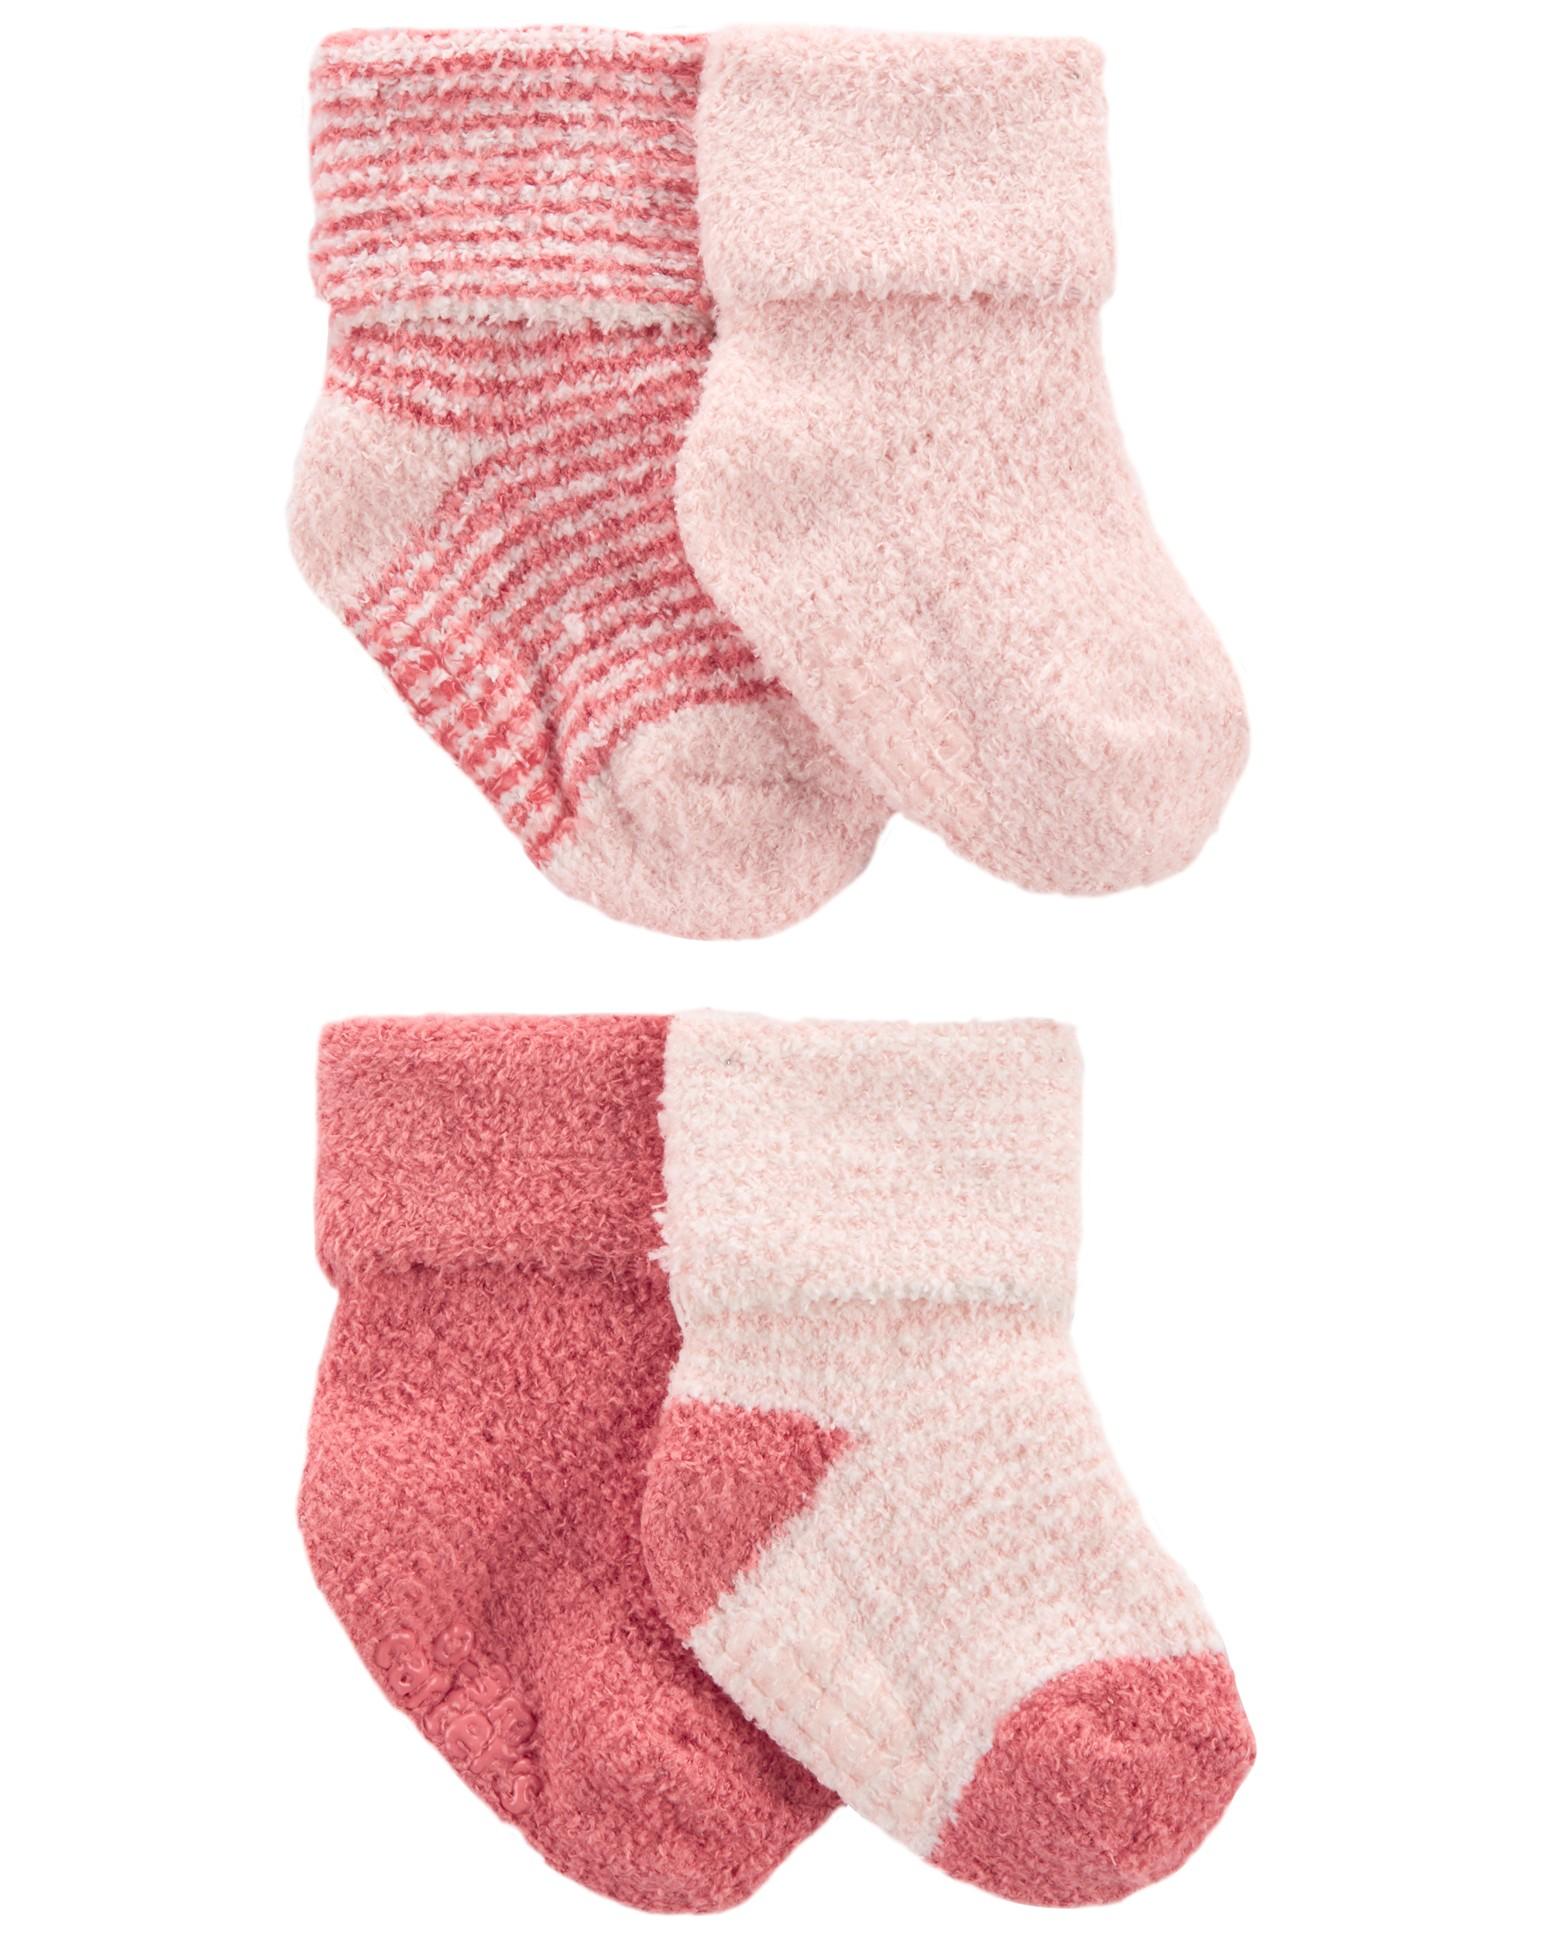 CARTER'S Ponožky Stripes Pink dievča LBB 4ks 12-24m